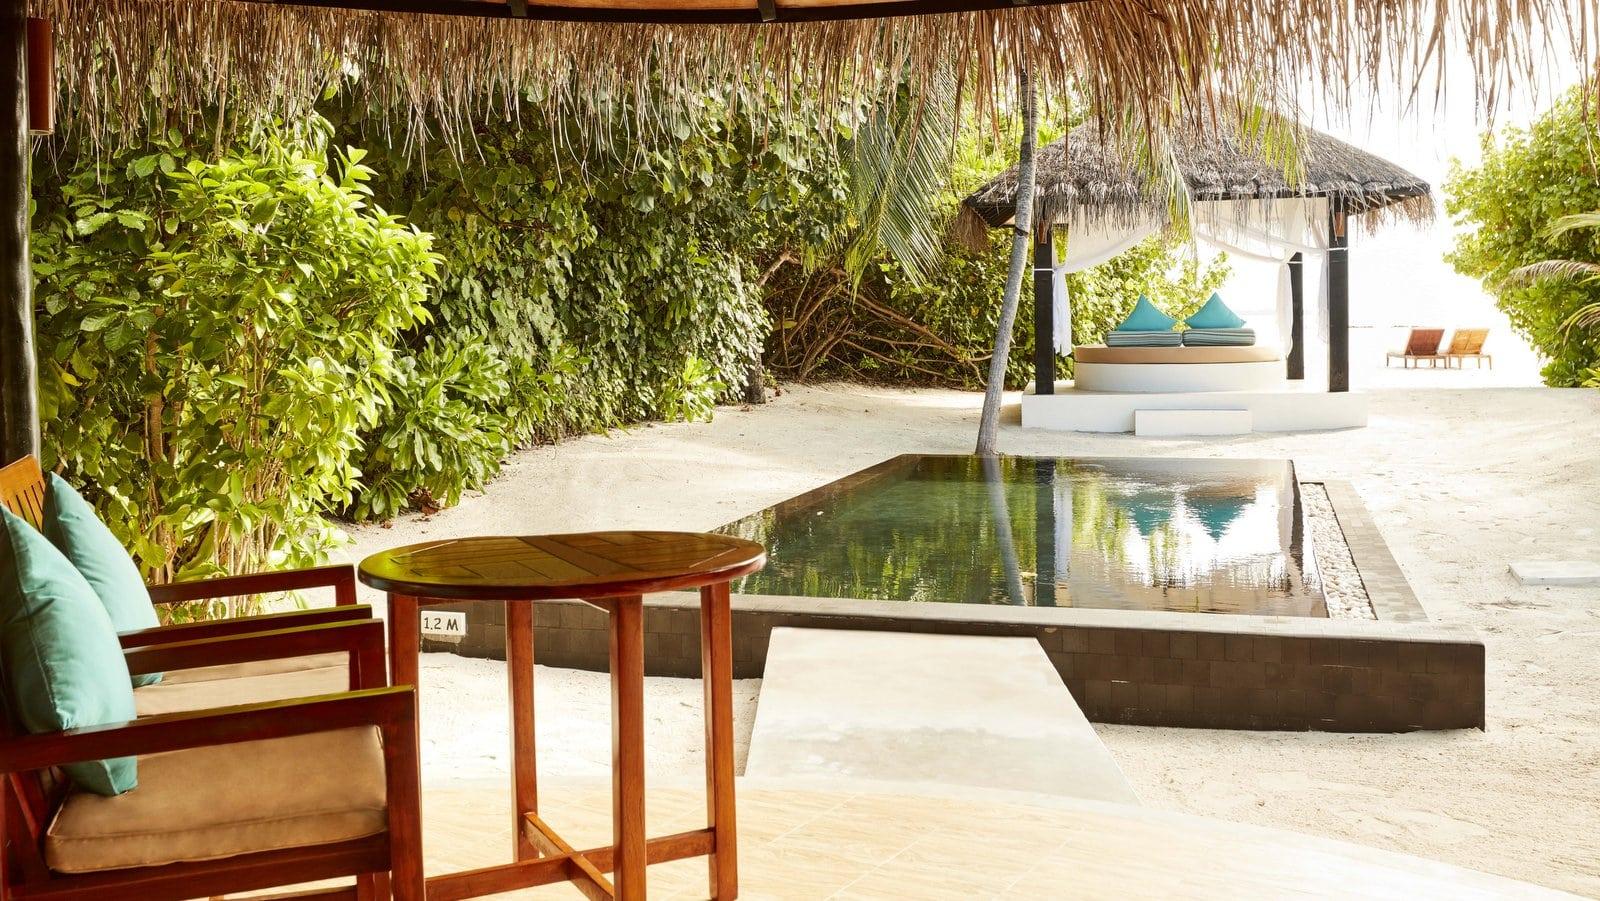 Мальдивы, отель Sun Siyam Iru Fushi, номер Deluxe Beach Villa with Pool